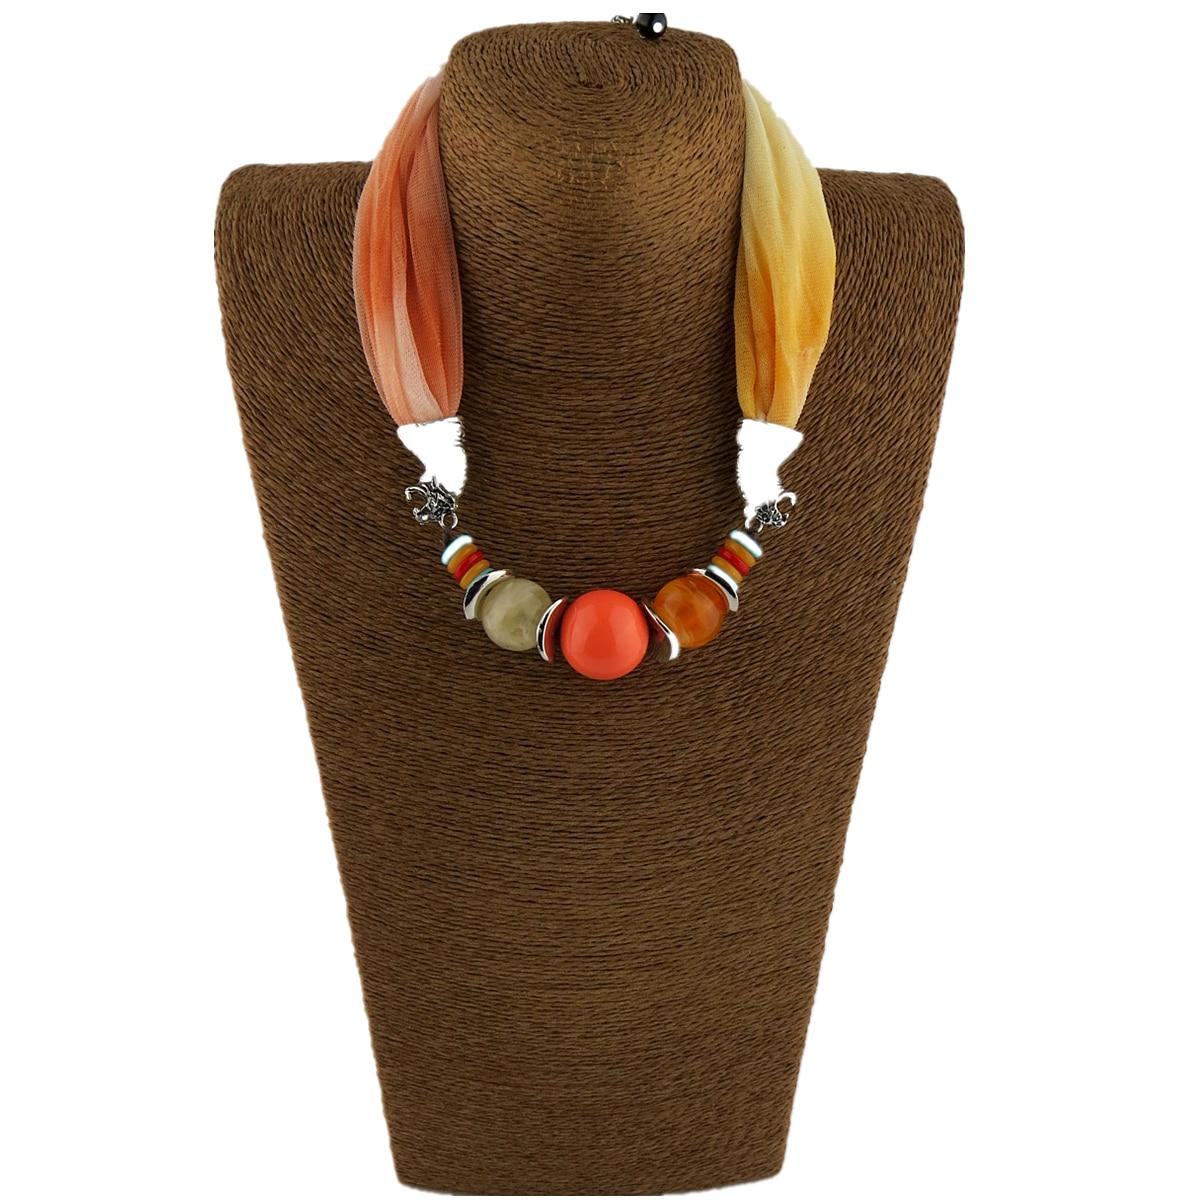 Fashion Scarf Beads Pendant Design Ladies Scarf Jewelry Necklace Pendant